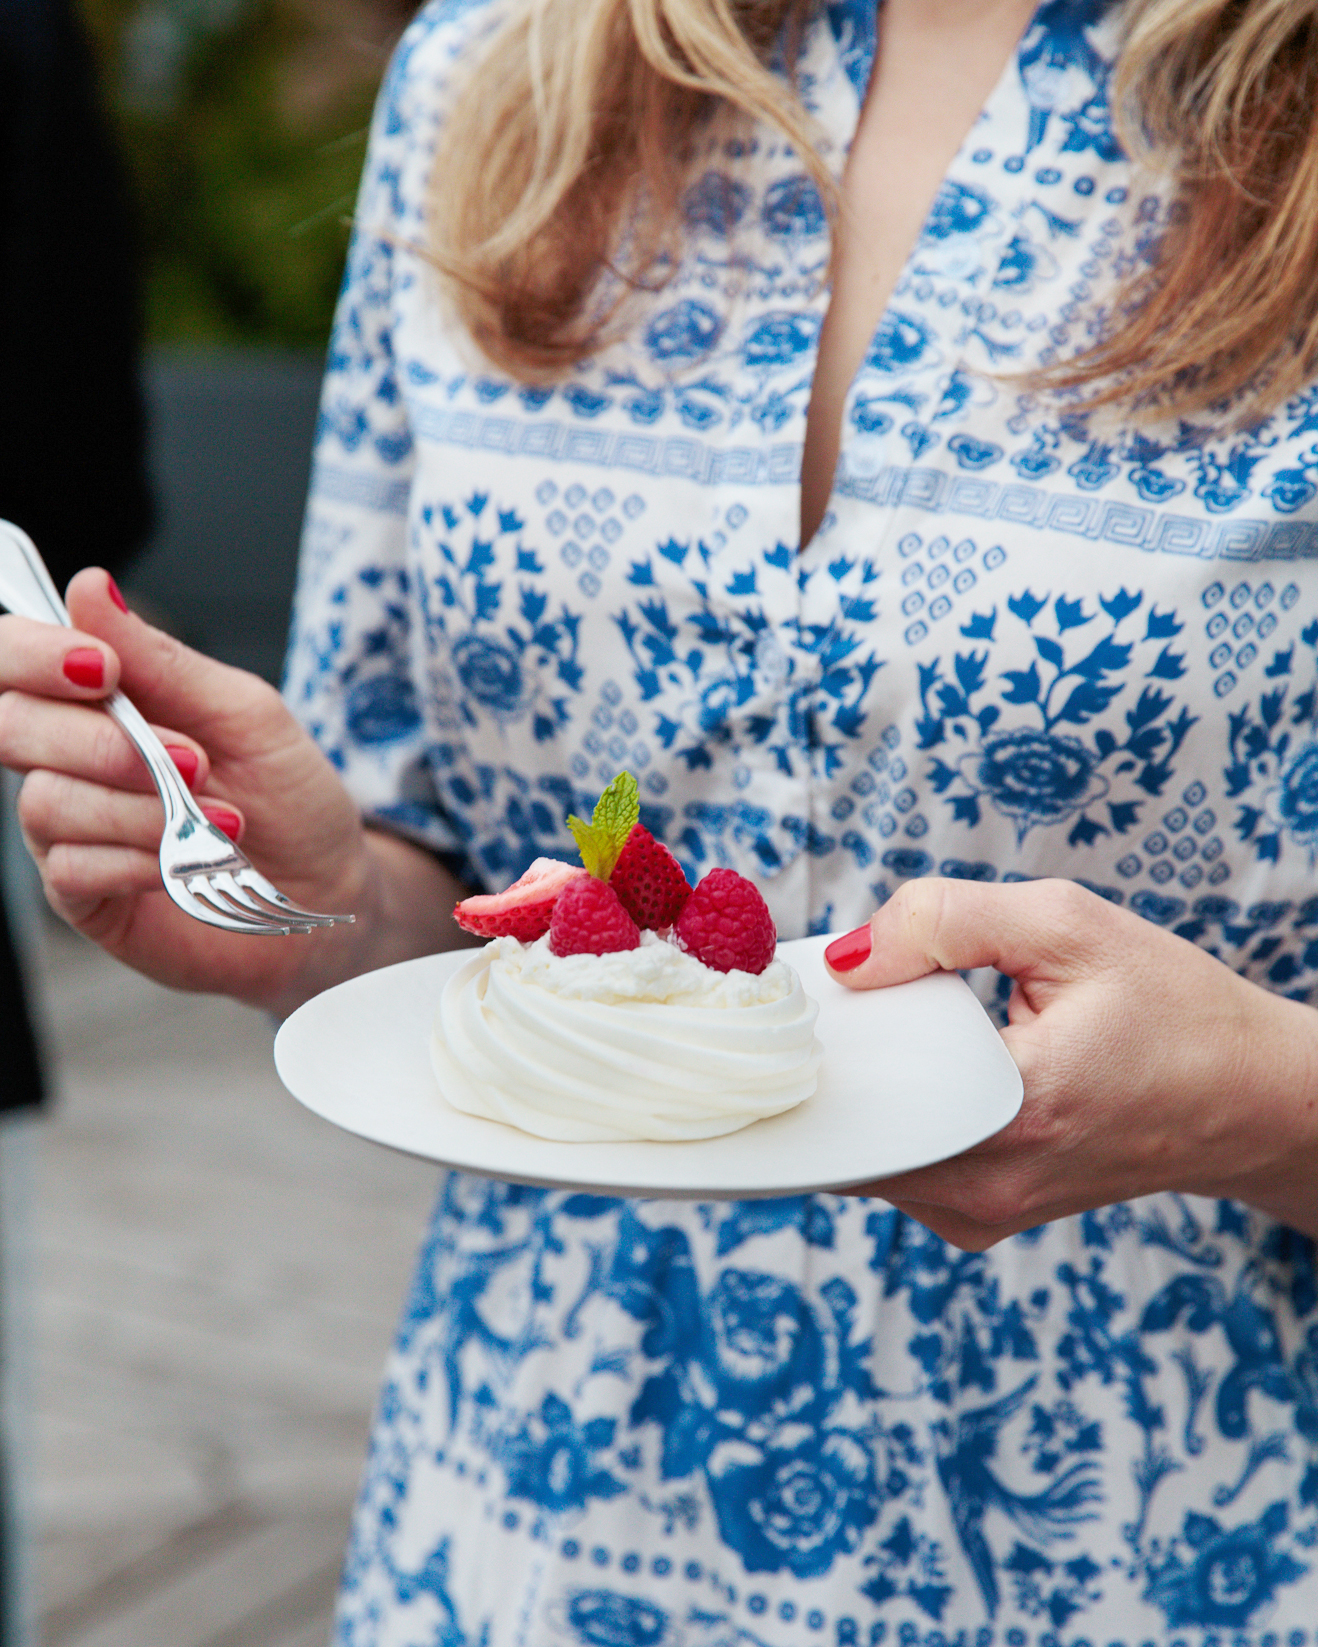 blake-chris-wedding-wd110141-dessert-0514.jpg